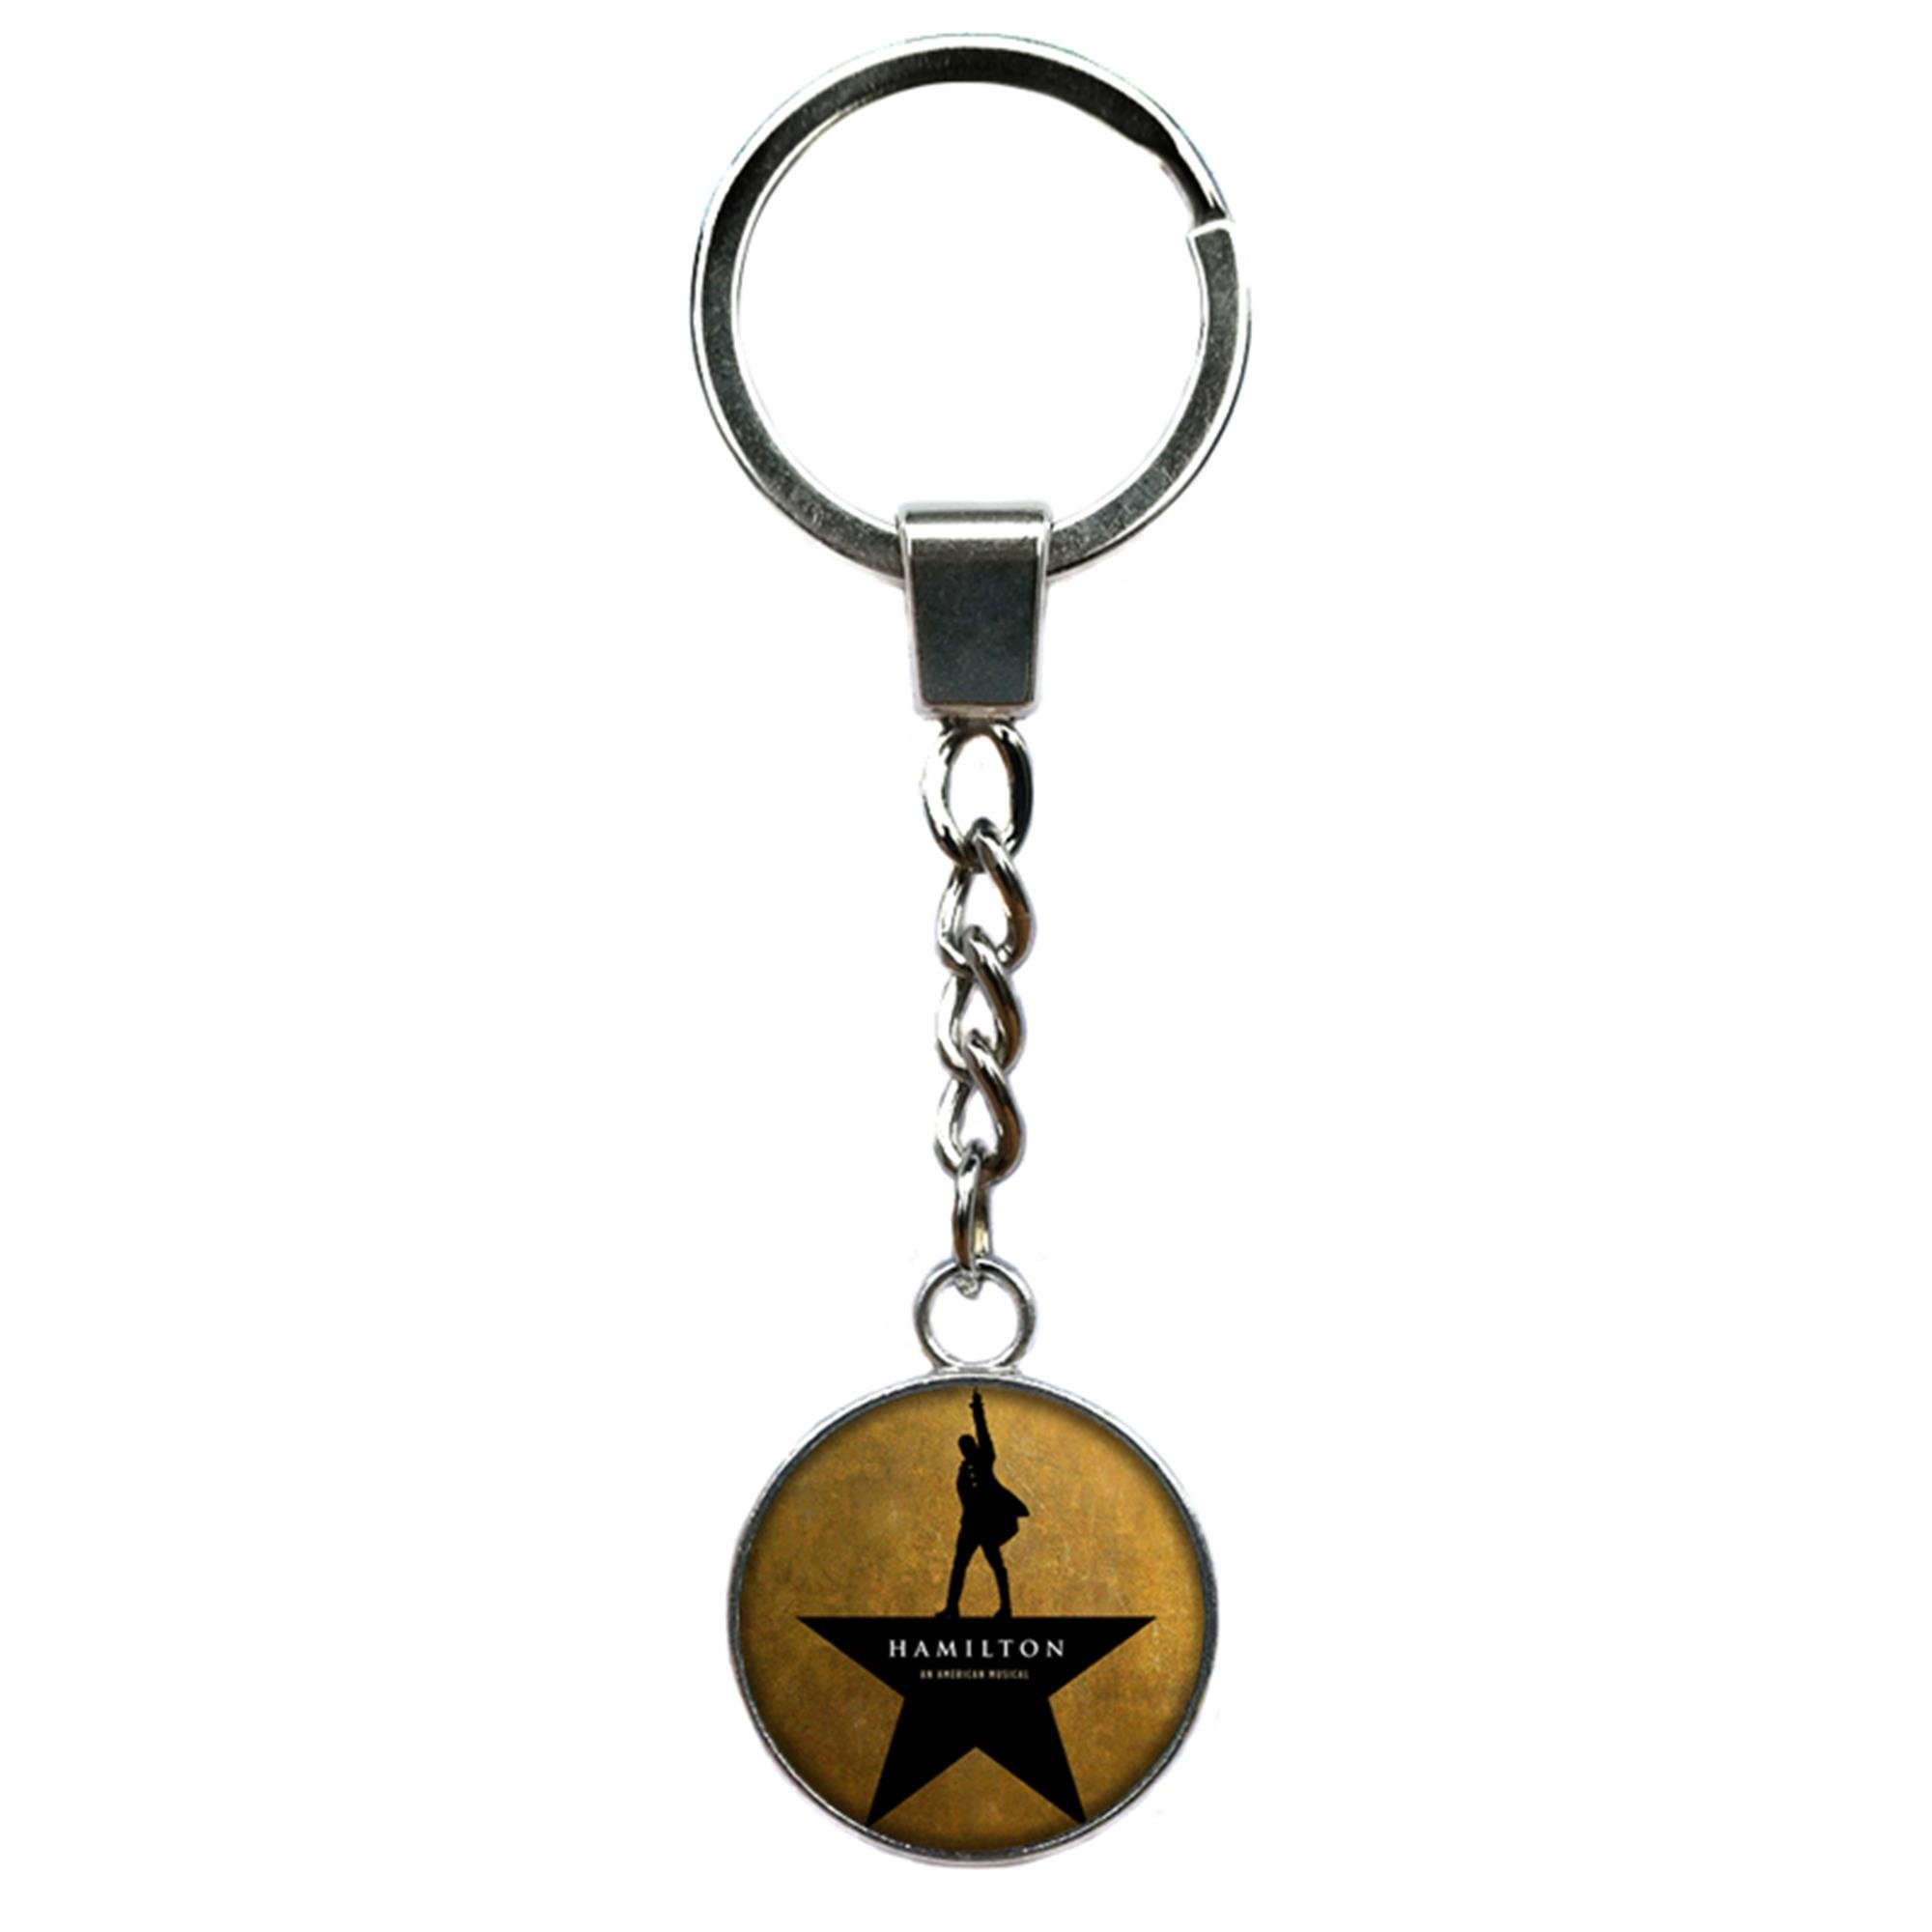 Outlander Brand Hamilton Broadway Musical Premium Quality Silvertone Keychain Key Ring w/Gift Box